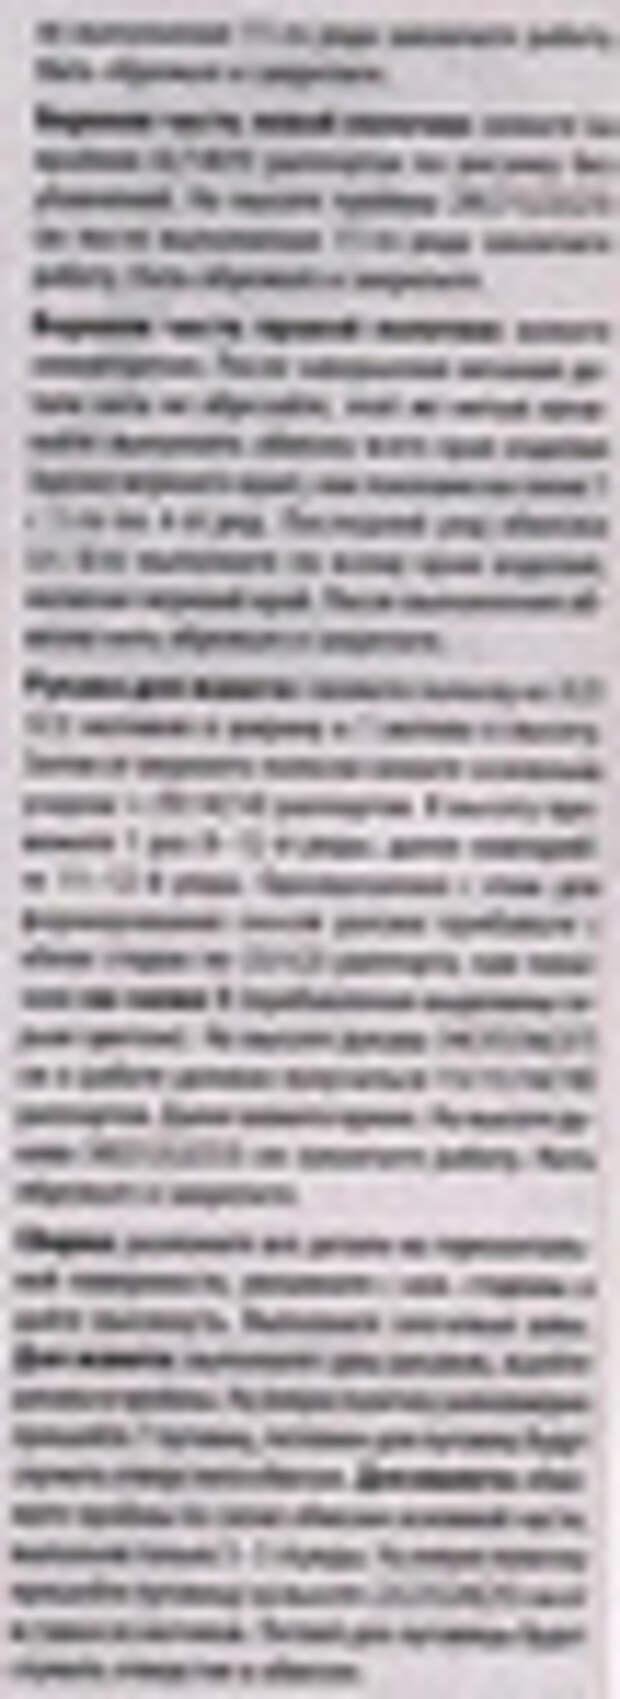 Превью vRm_Sr7YN34 (3) (254x700, 196Kb)